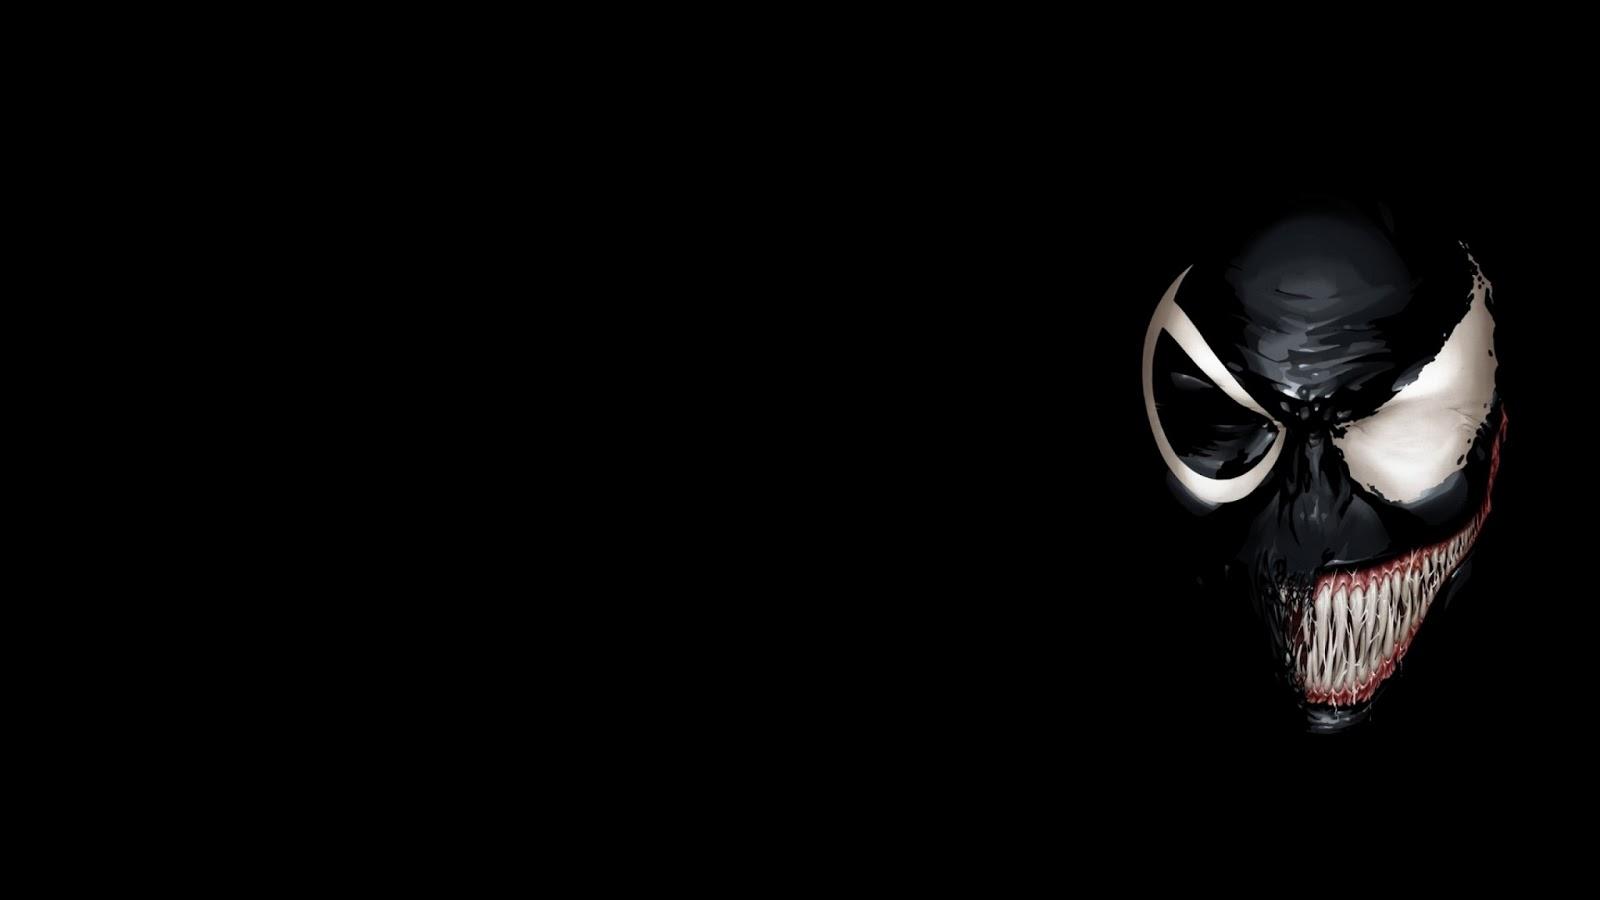 Venom HD Cartoons Wallpapers 1600x900